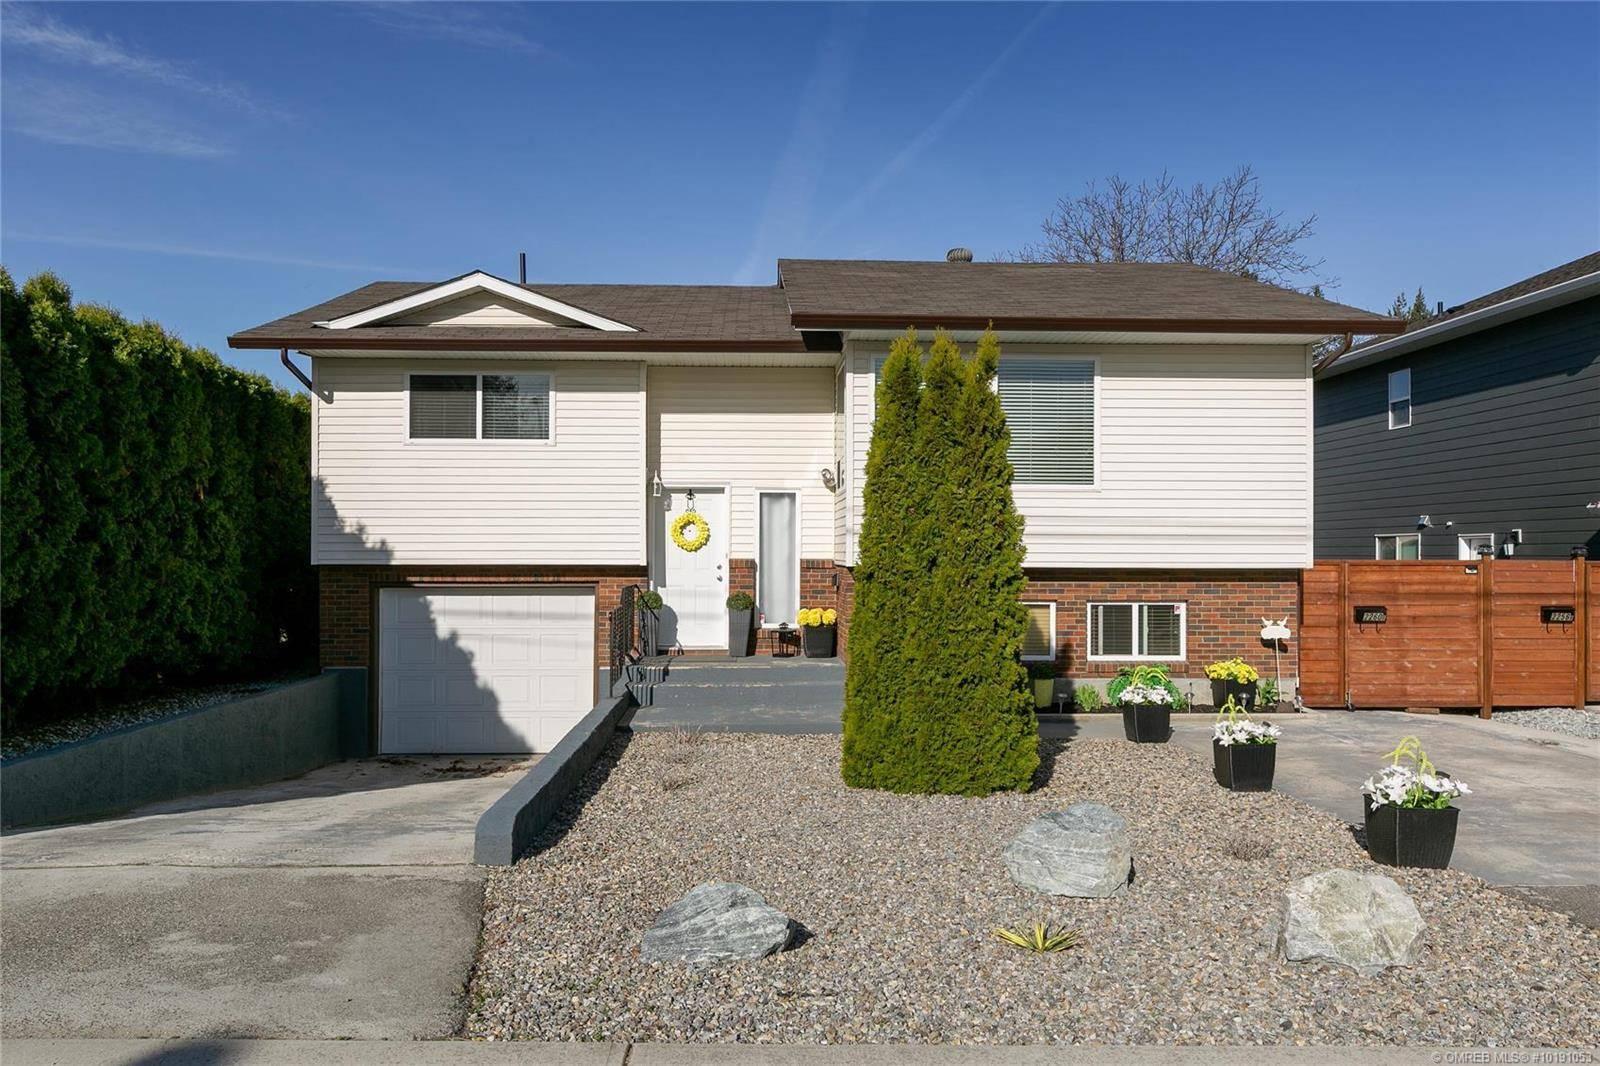 House for sale at 2260 Wilkinson St Kelowna British Columbia - MLS: 10191053